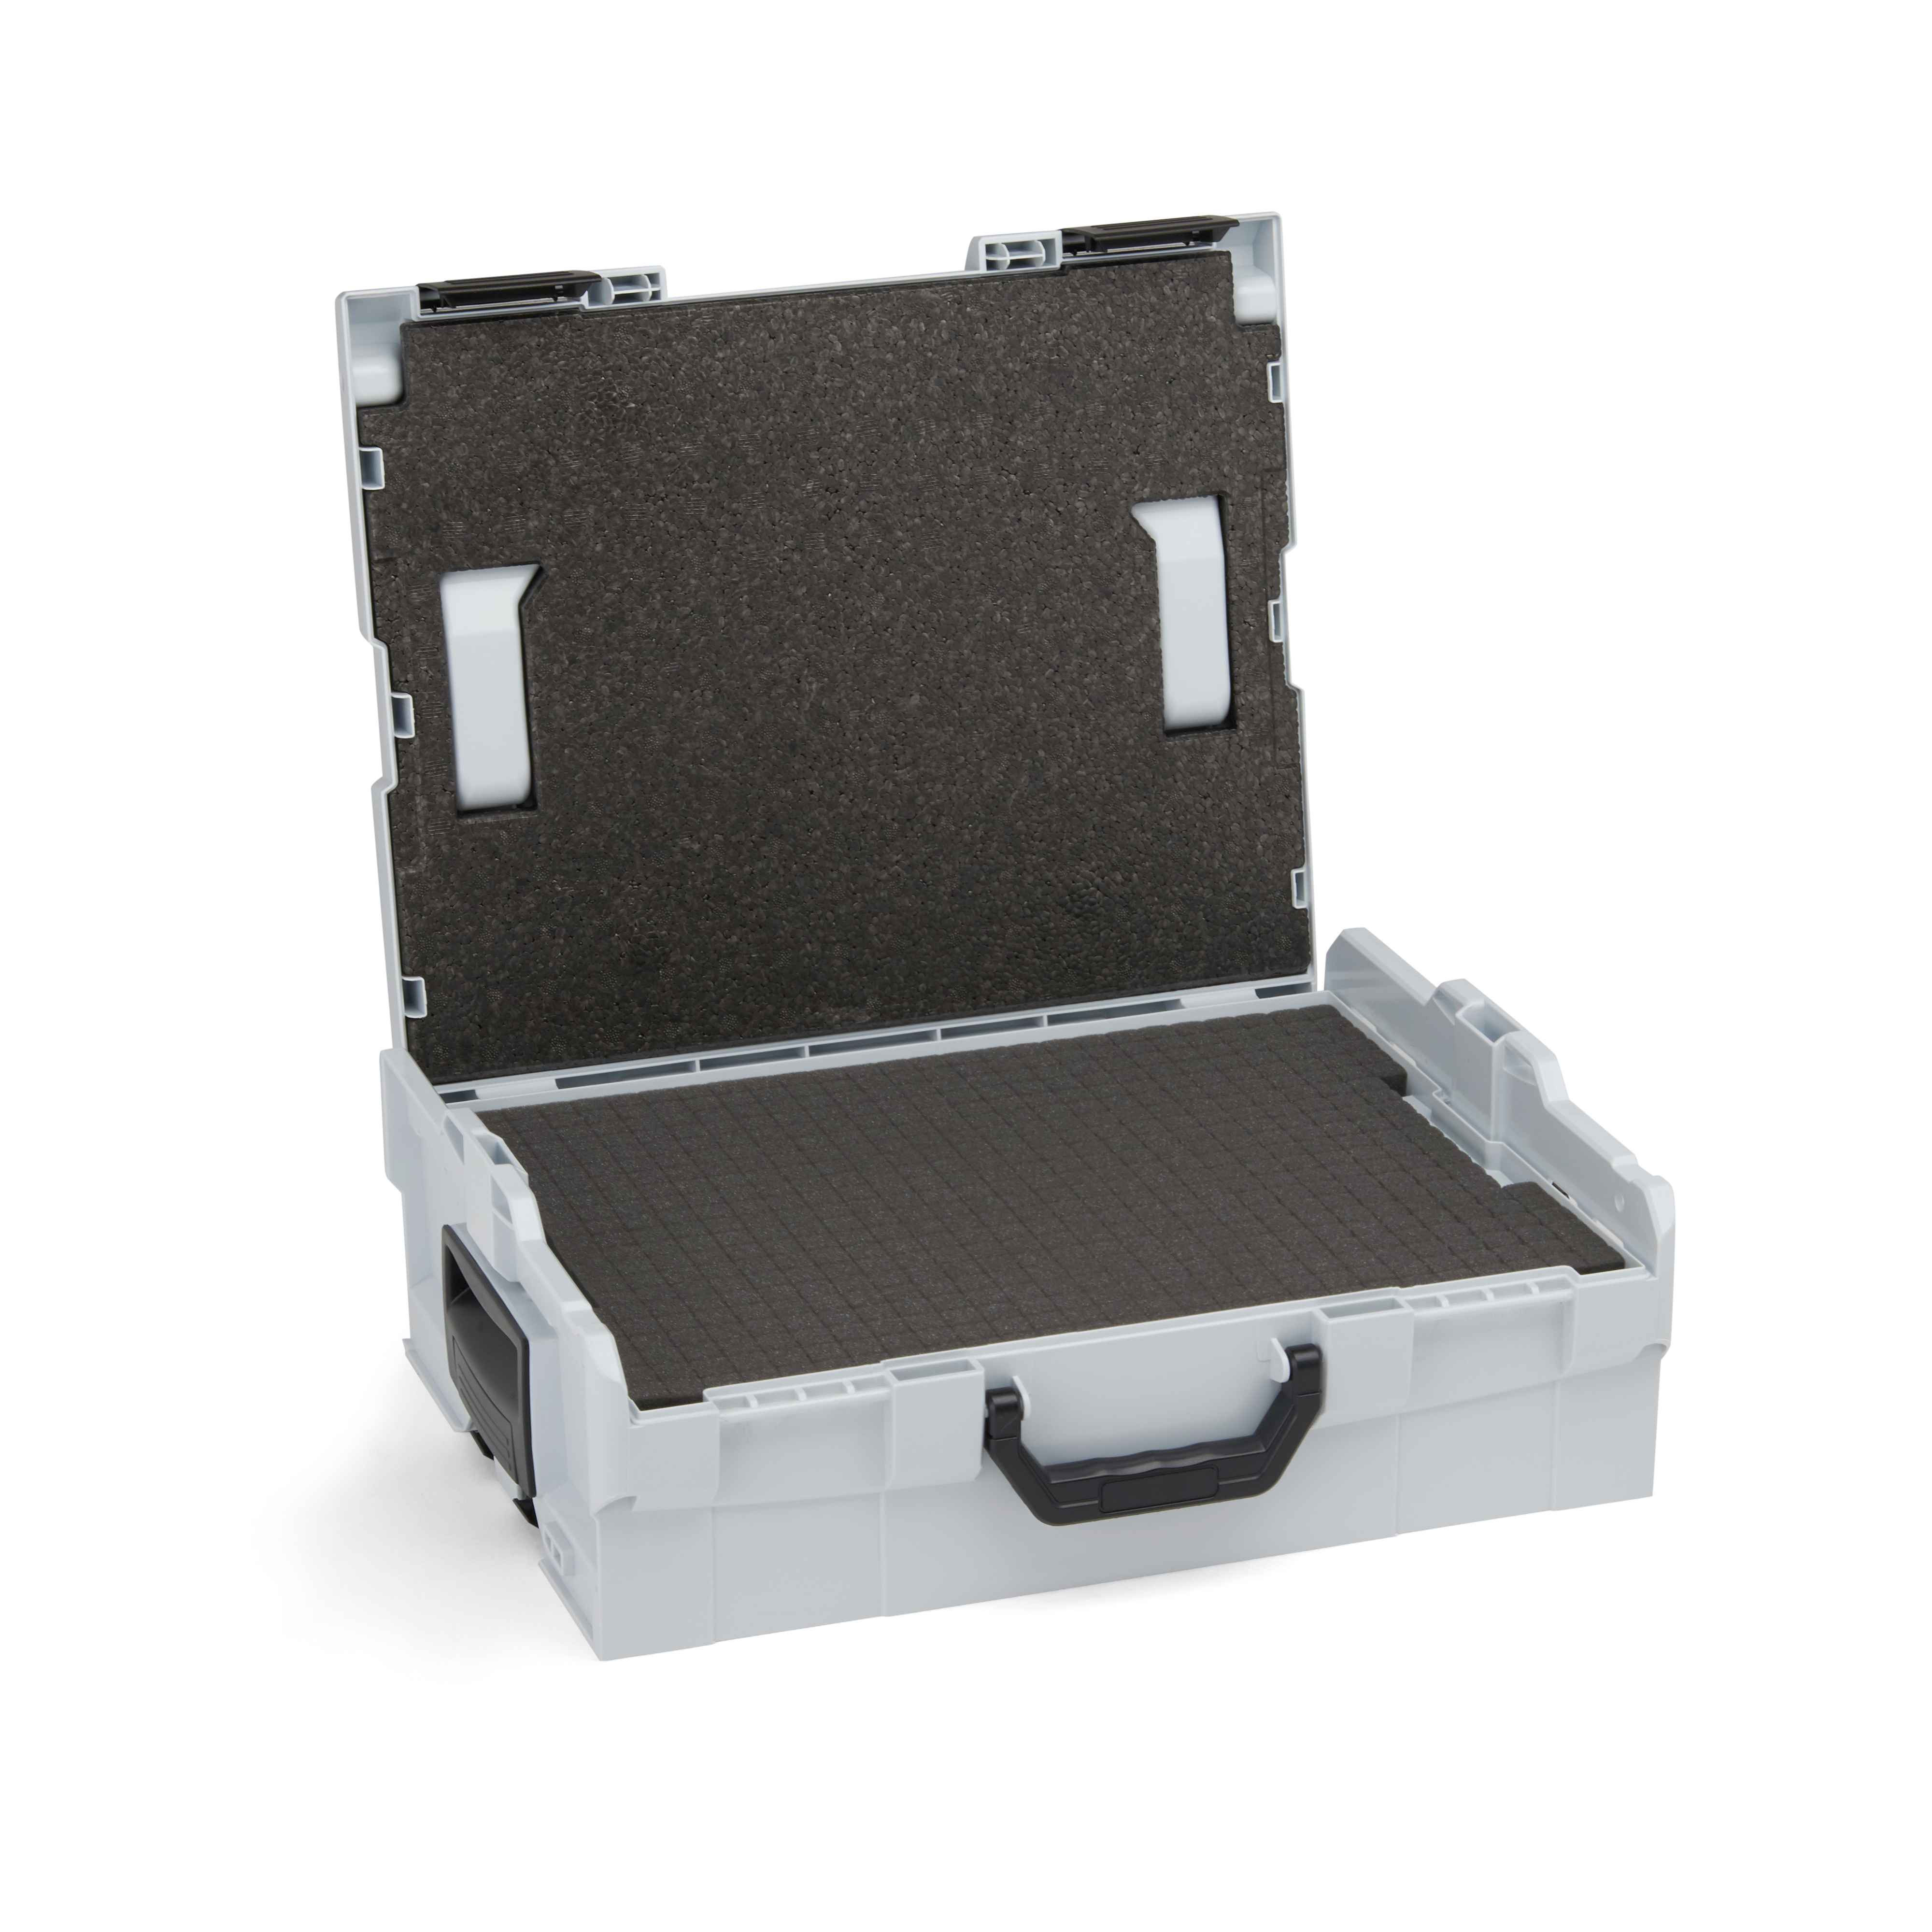 Bosch Sortimo Rasterschaumstoff für L-Boxx 102 innovatives Transportsystem